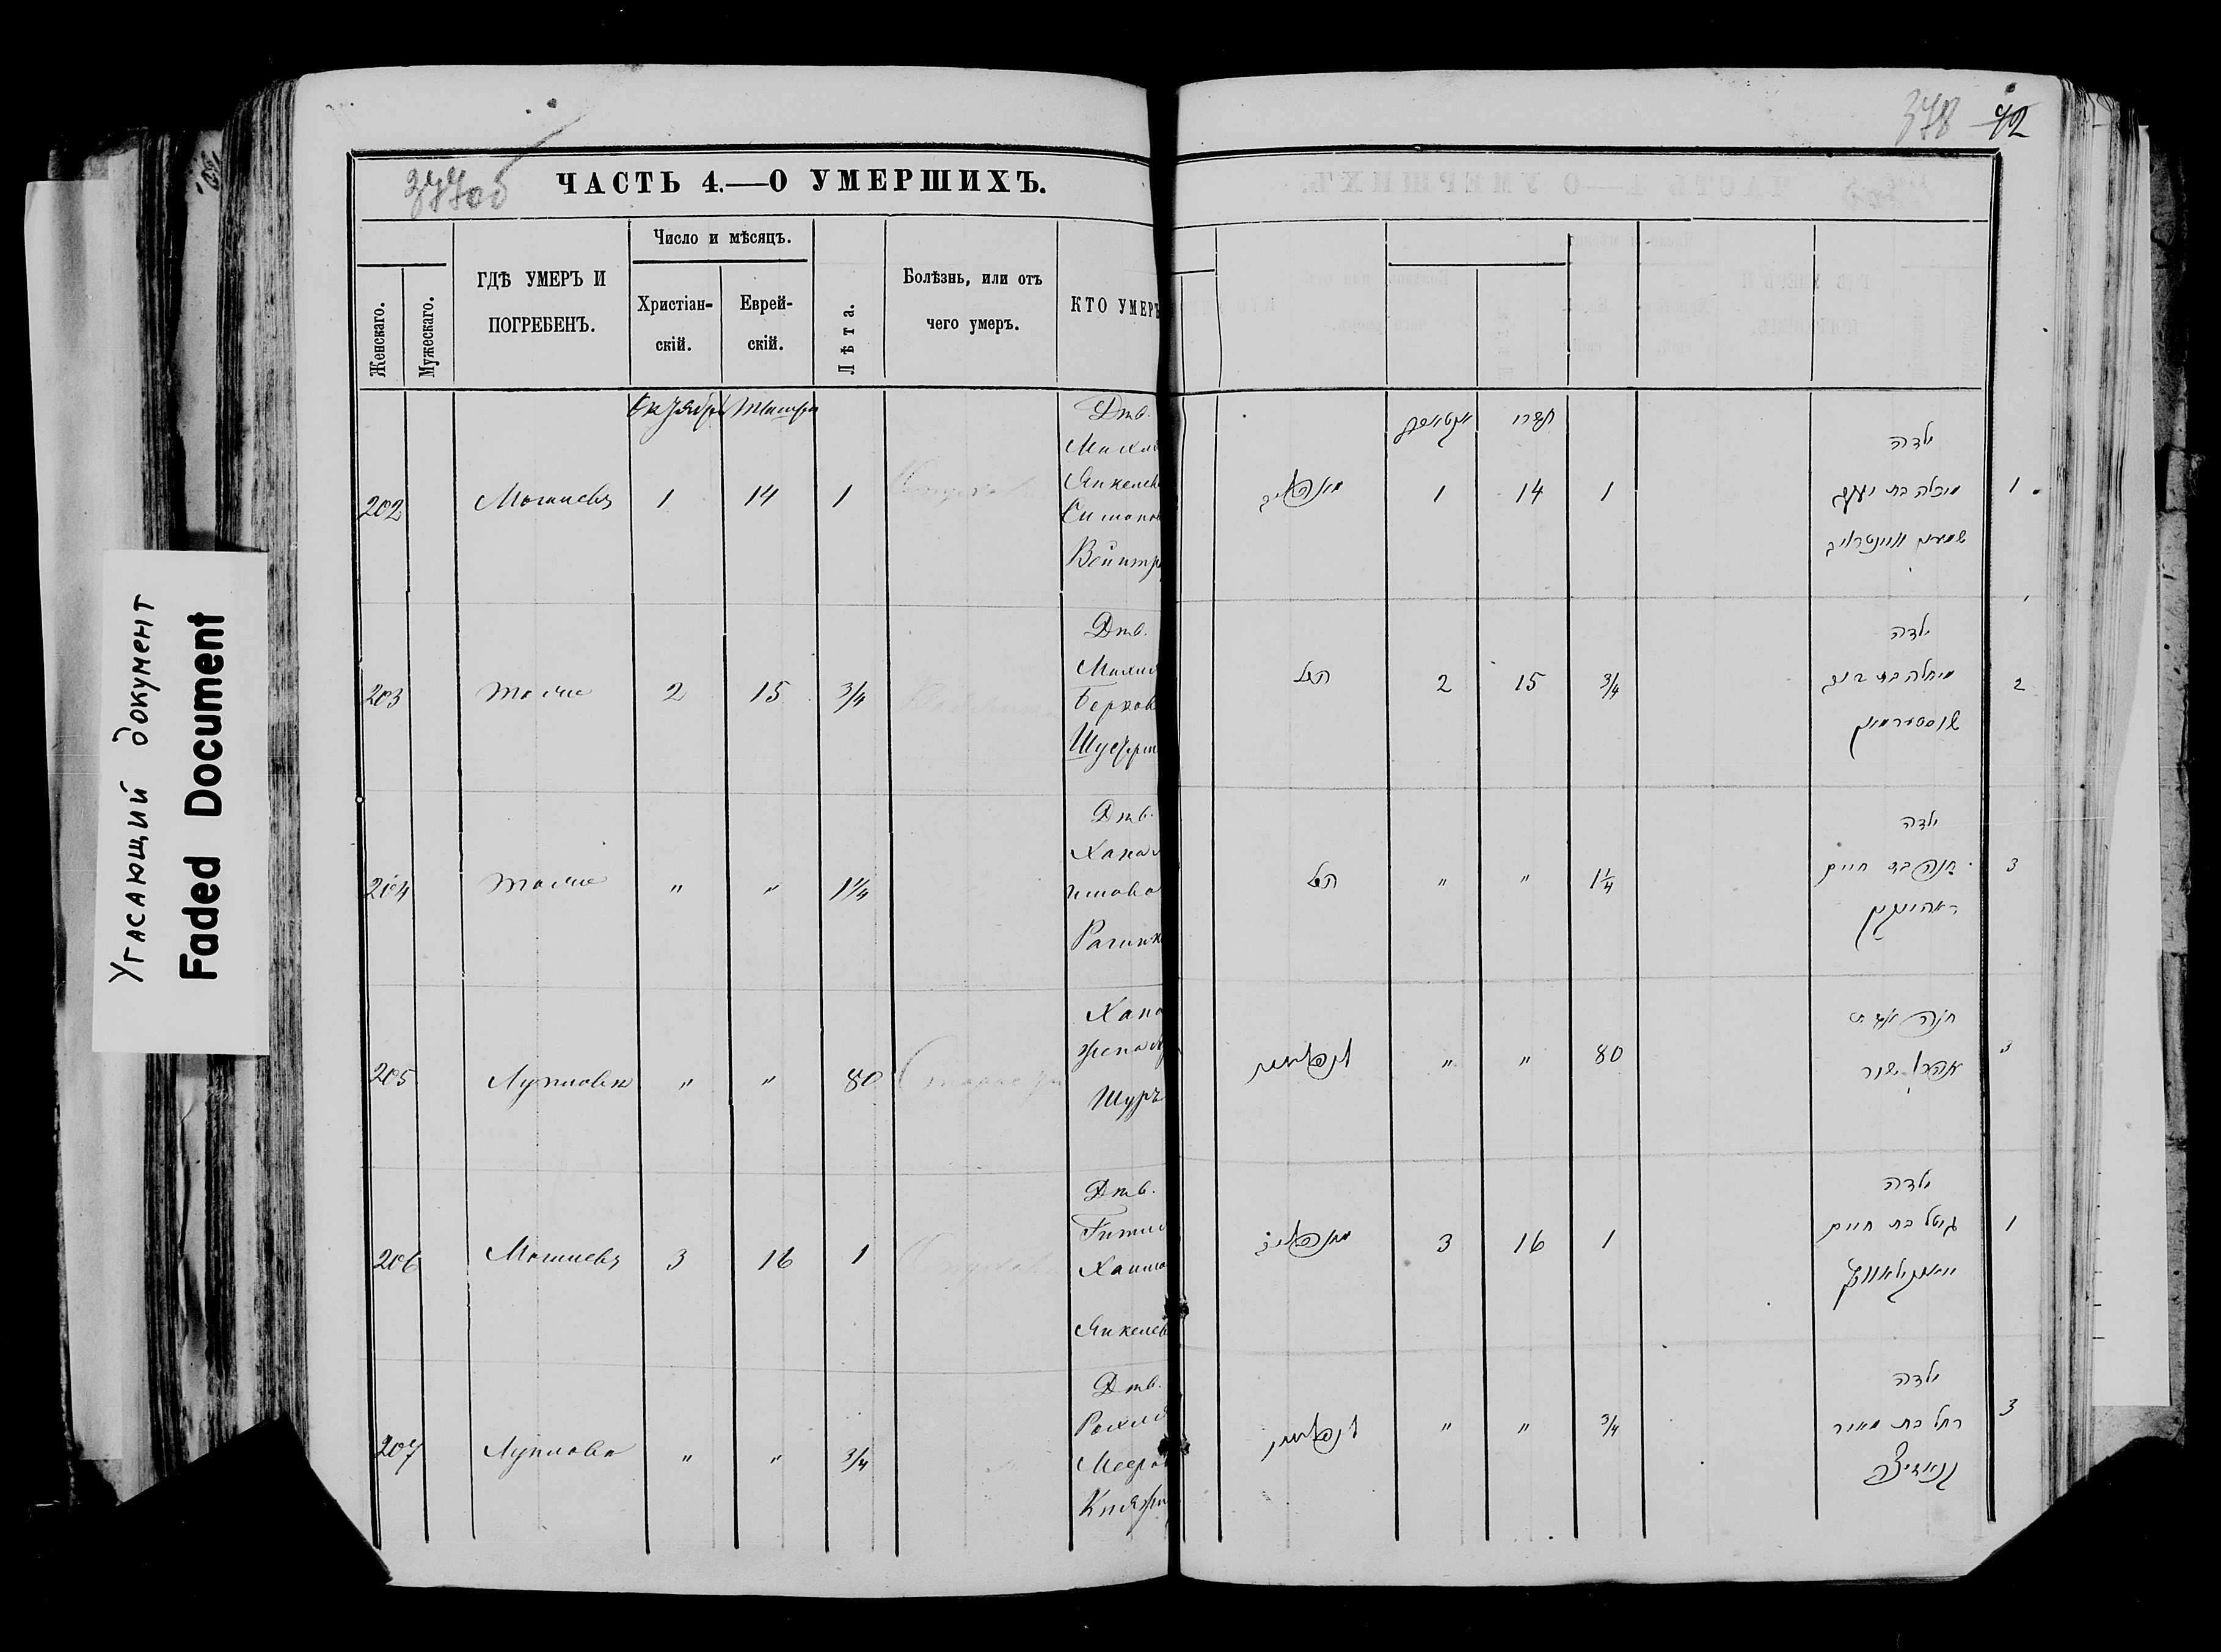 Хана жена Арона Шура ум. 2 октября 1875, запись 205, пленка 007766481, снимок 508